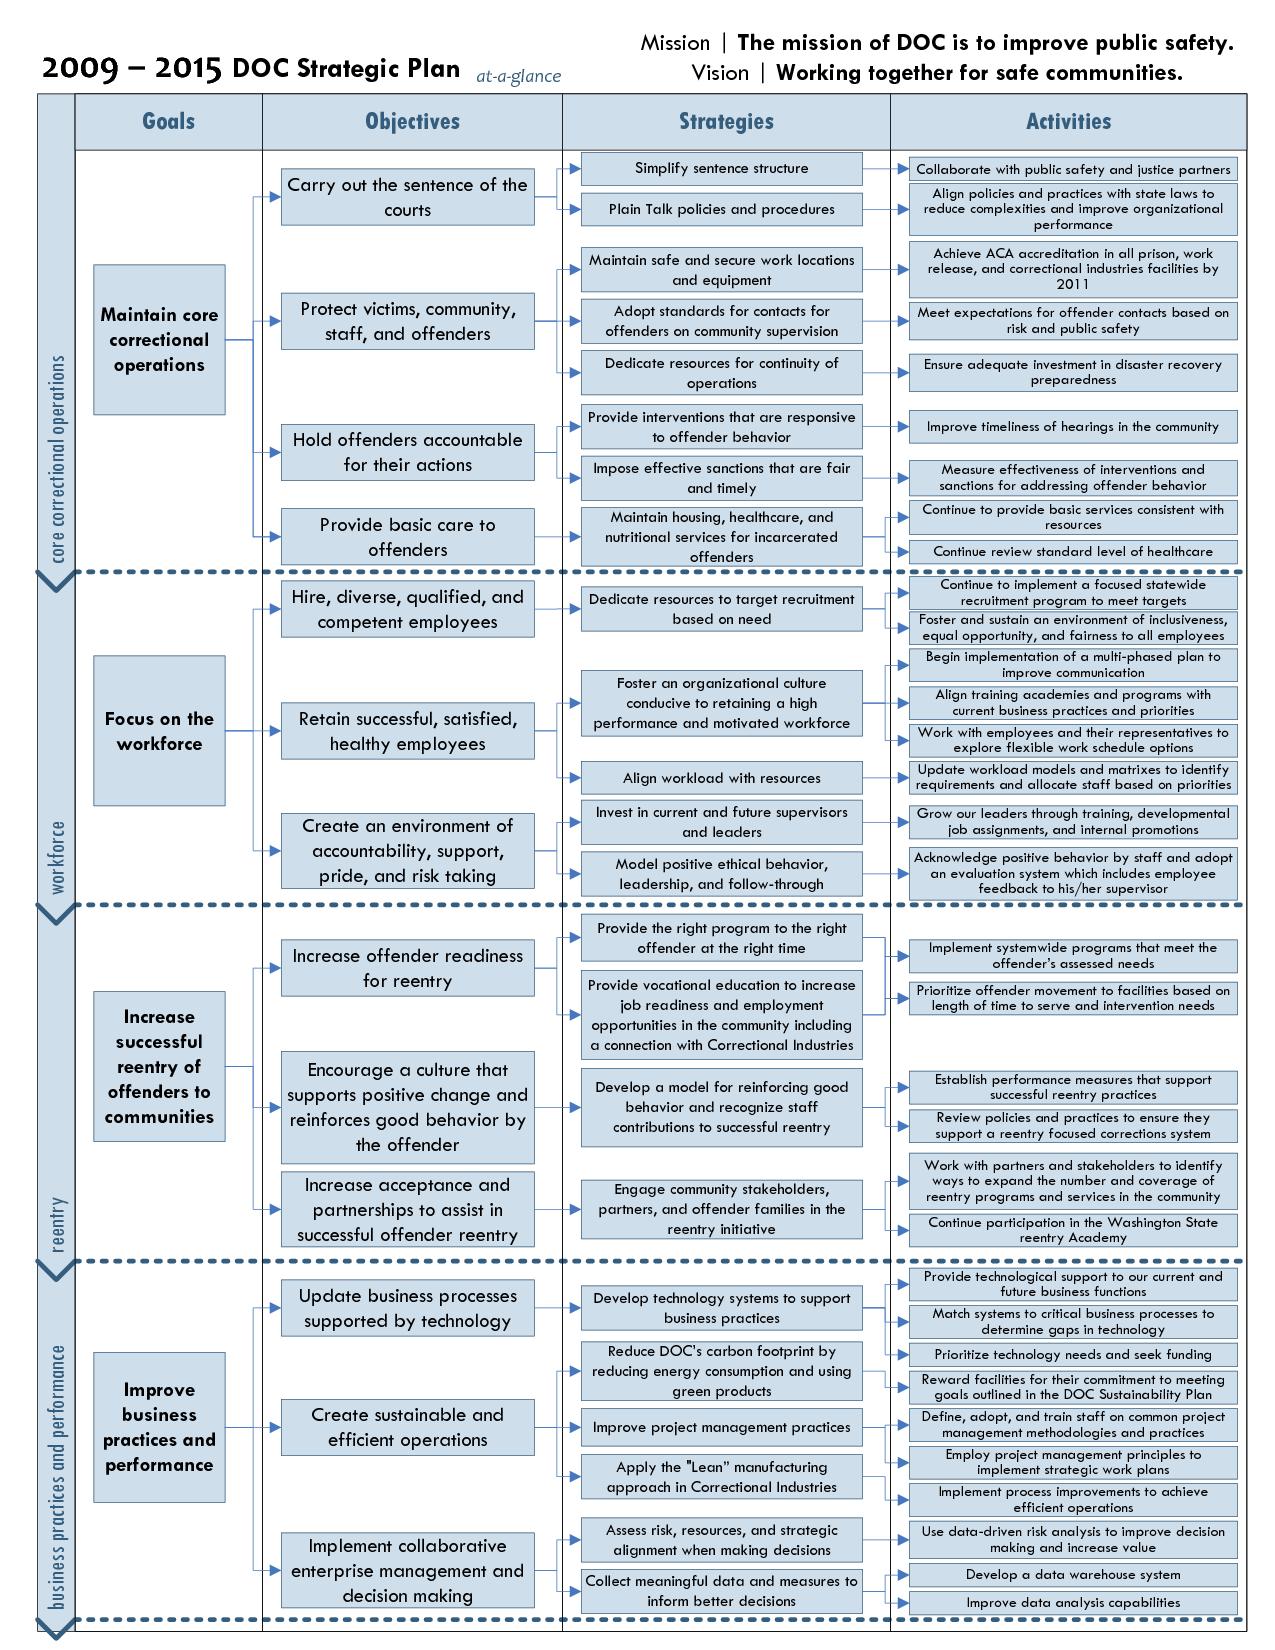 Free Strategic Plan Examples | One Page Strategic Plan ...